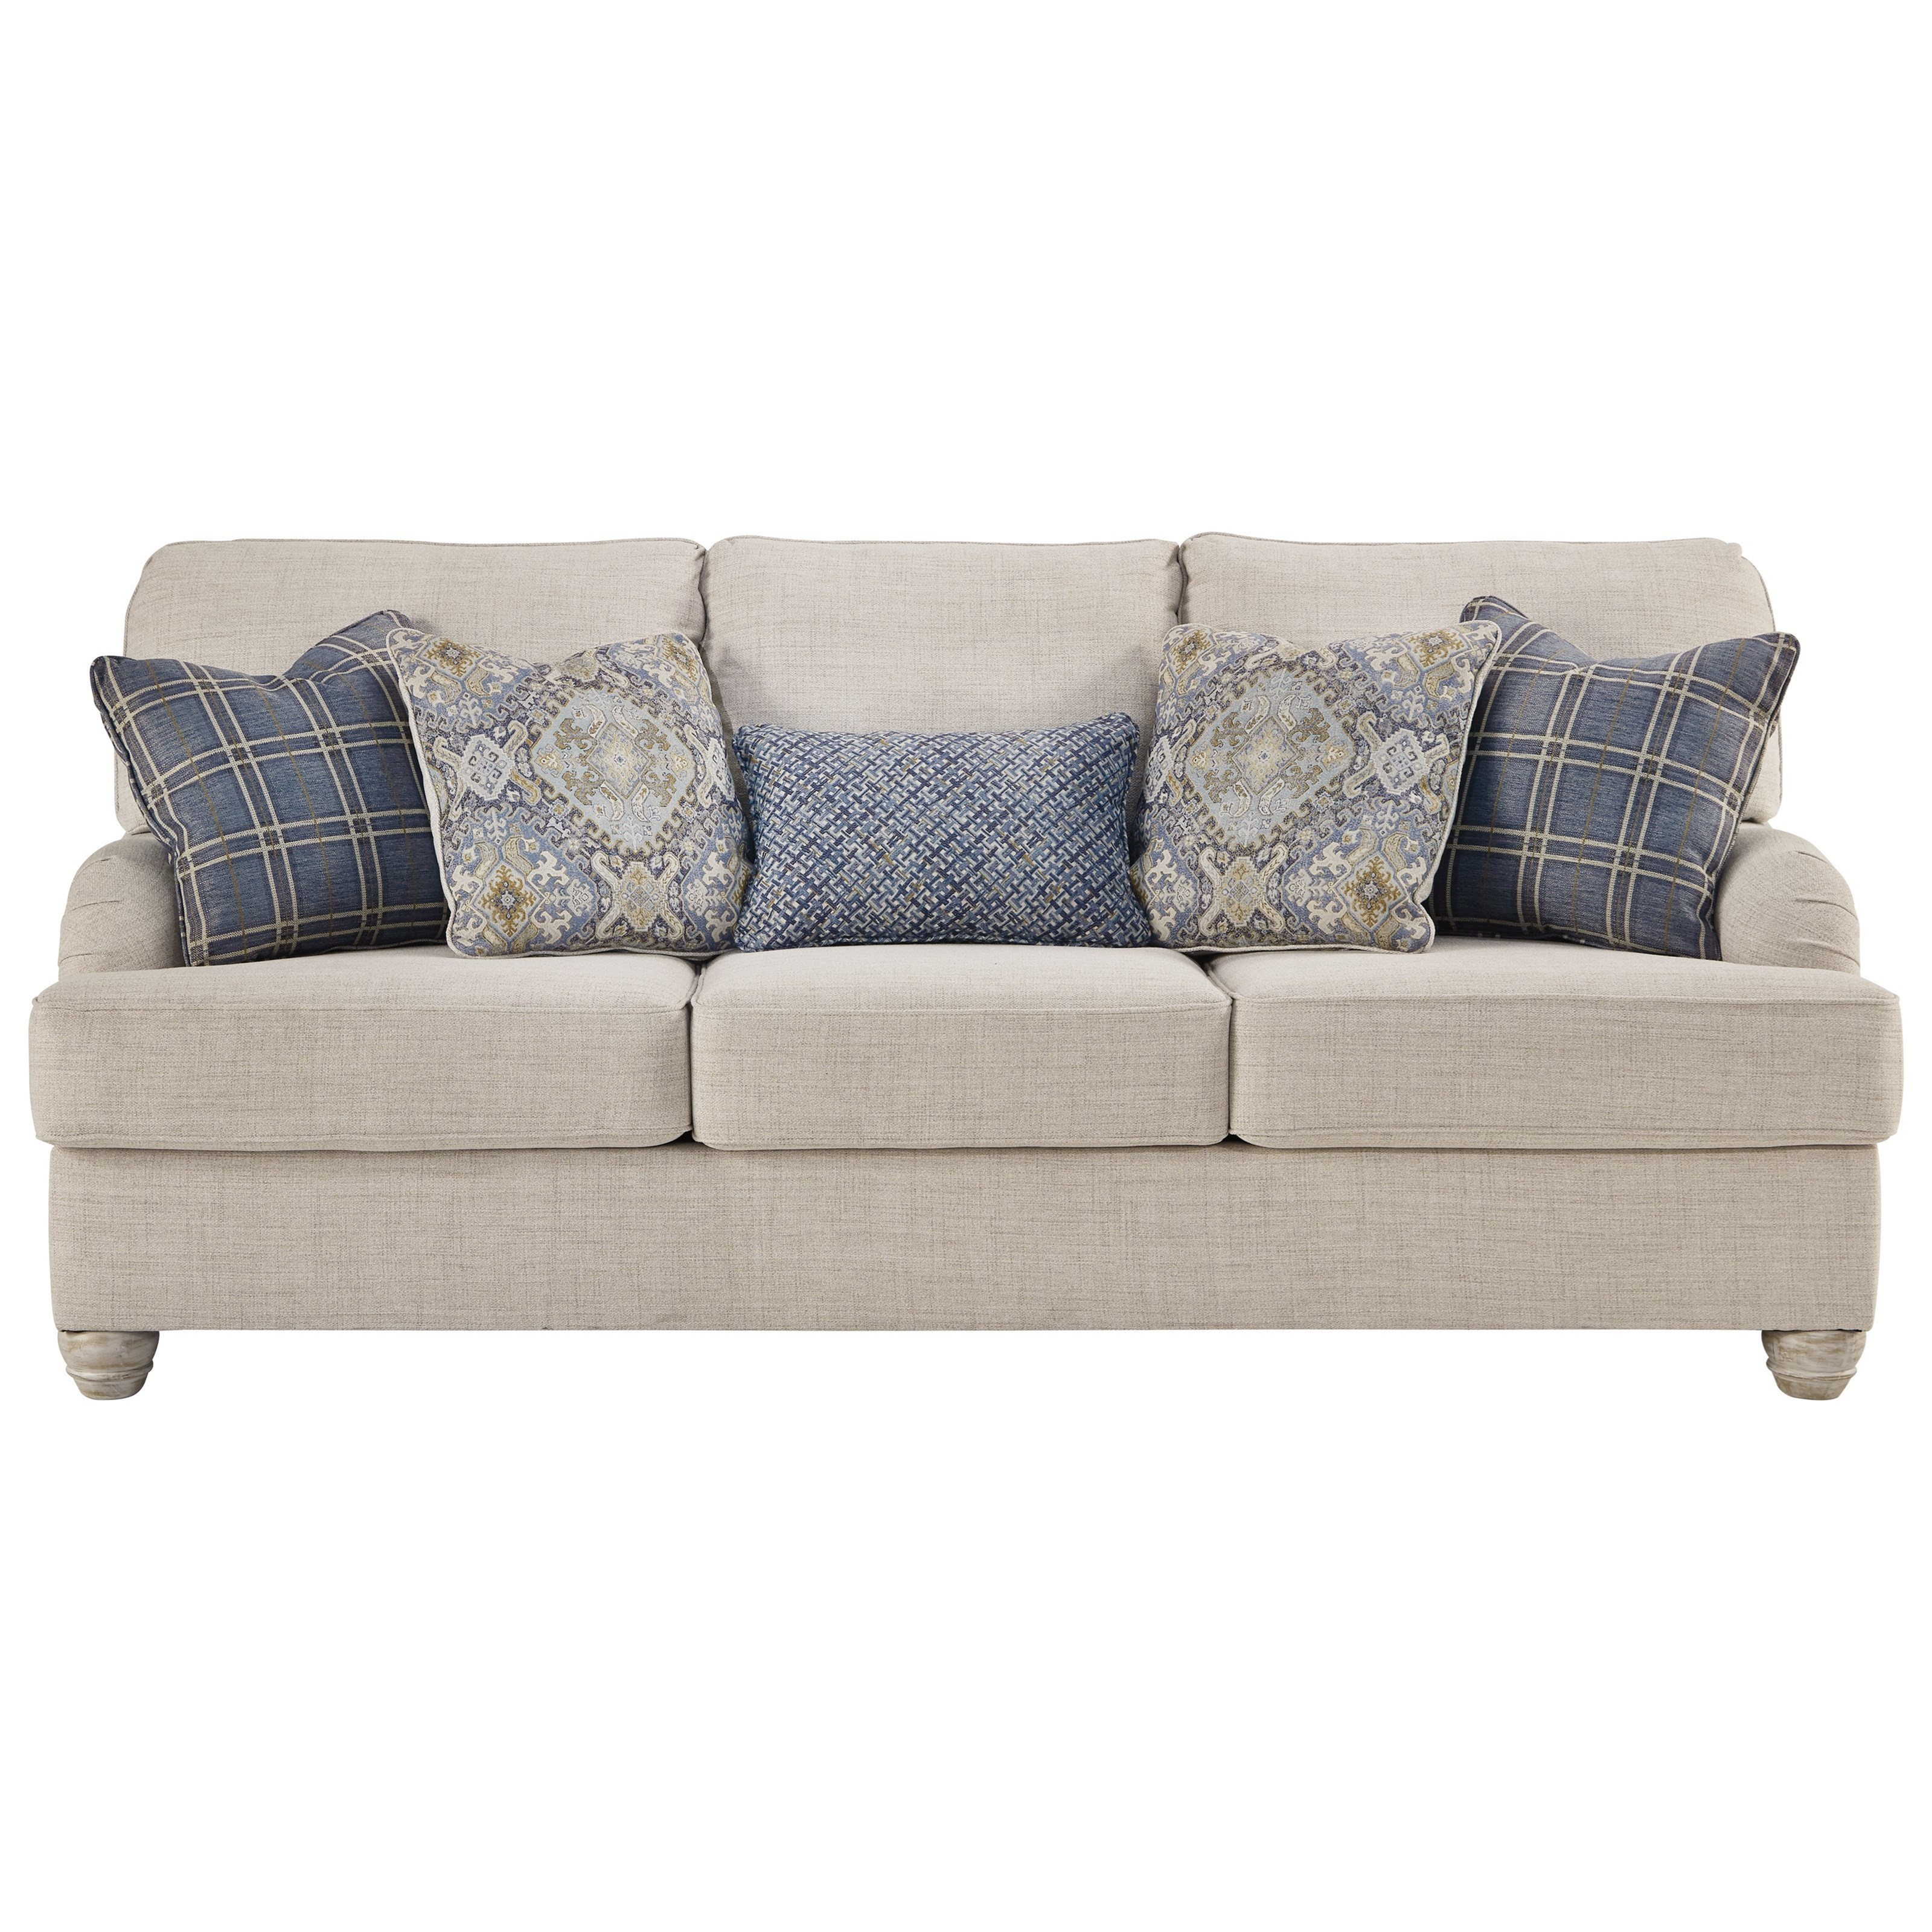 Traemore Queen Sofa Sleeper